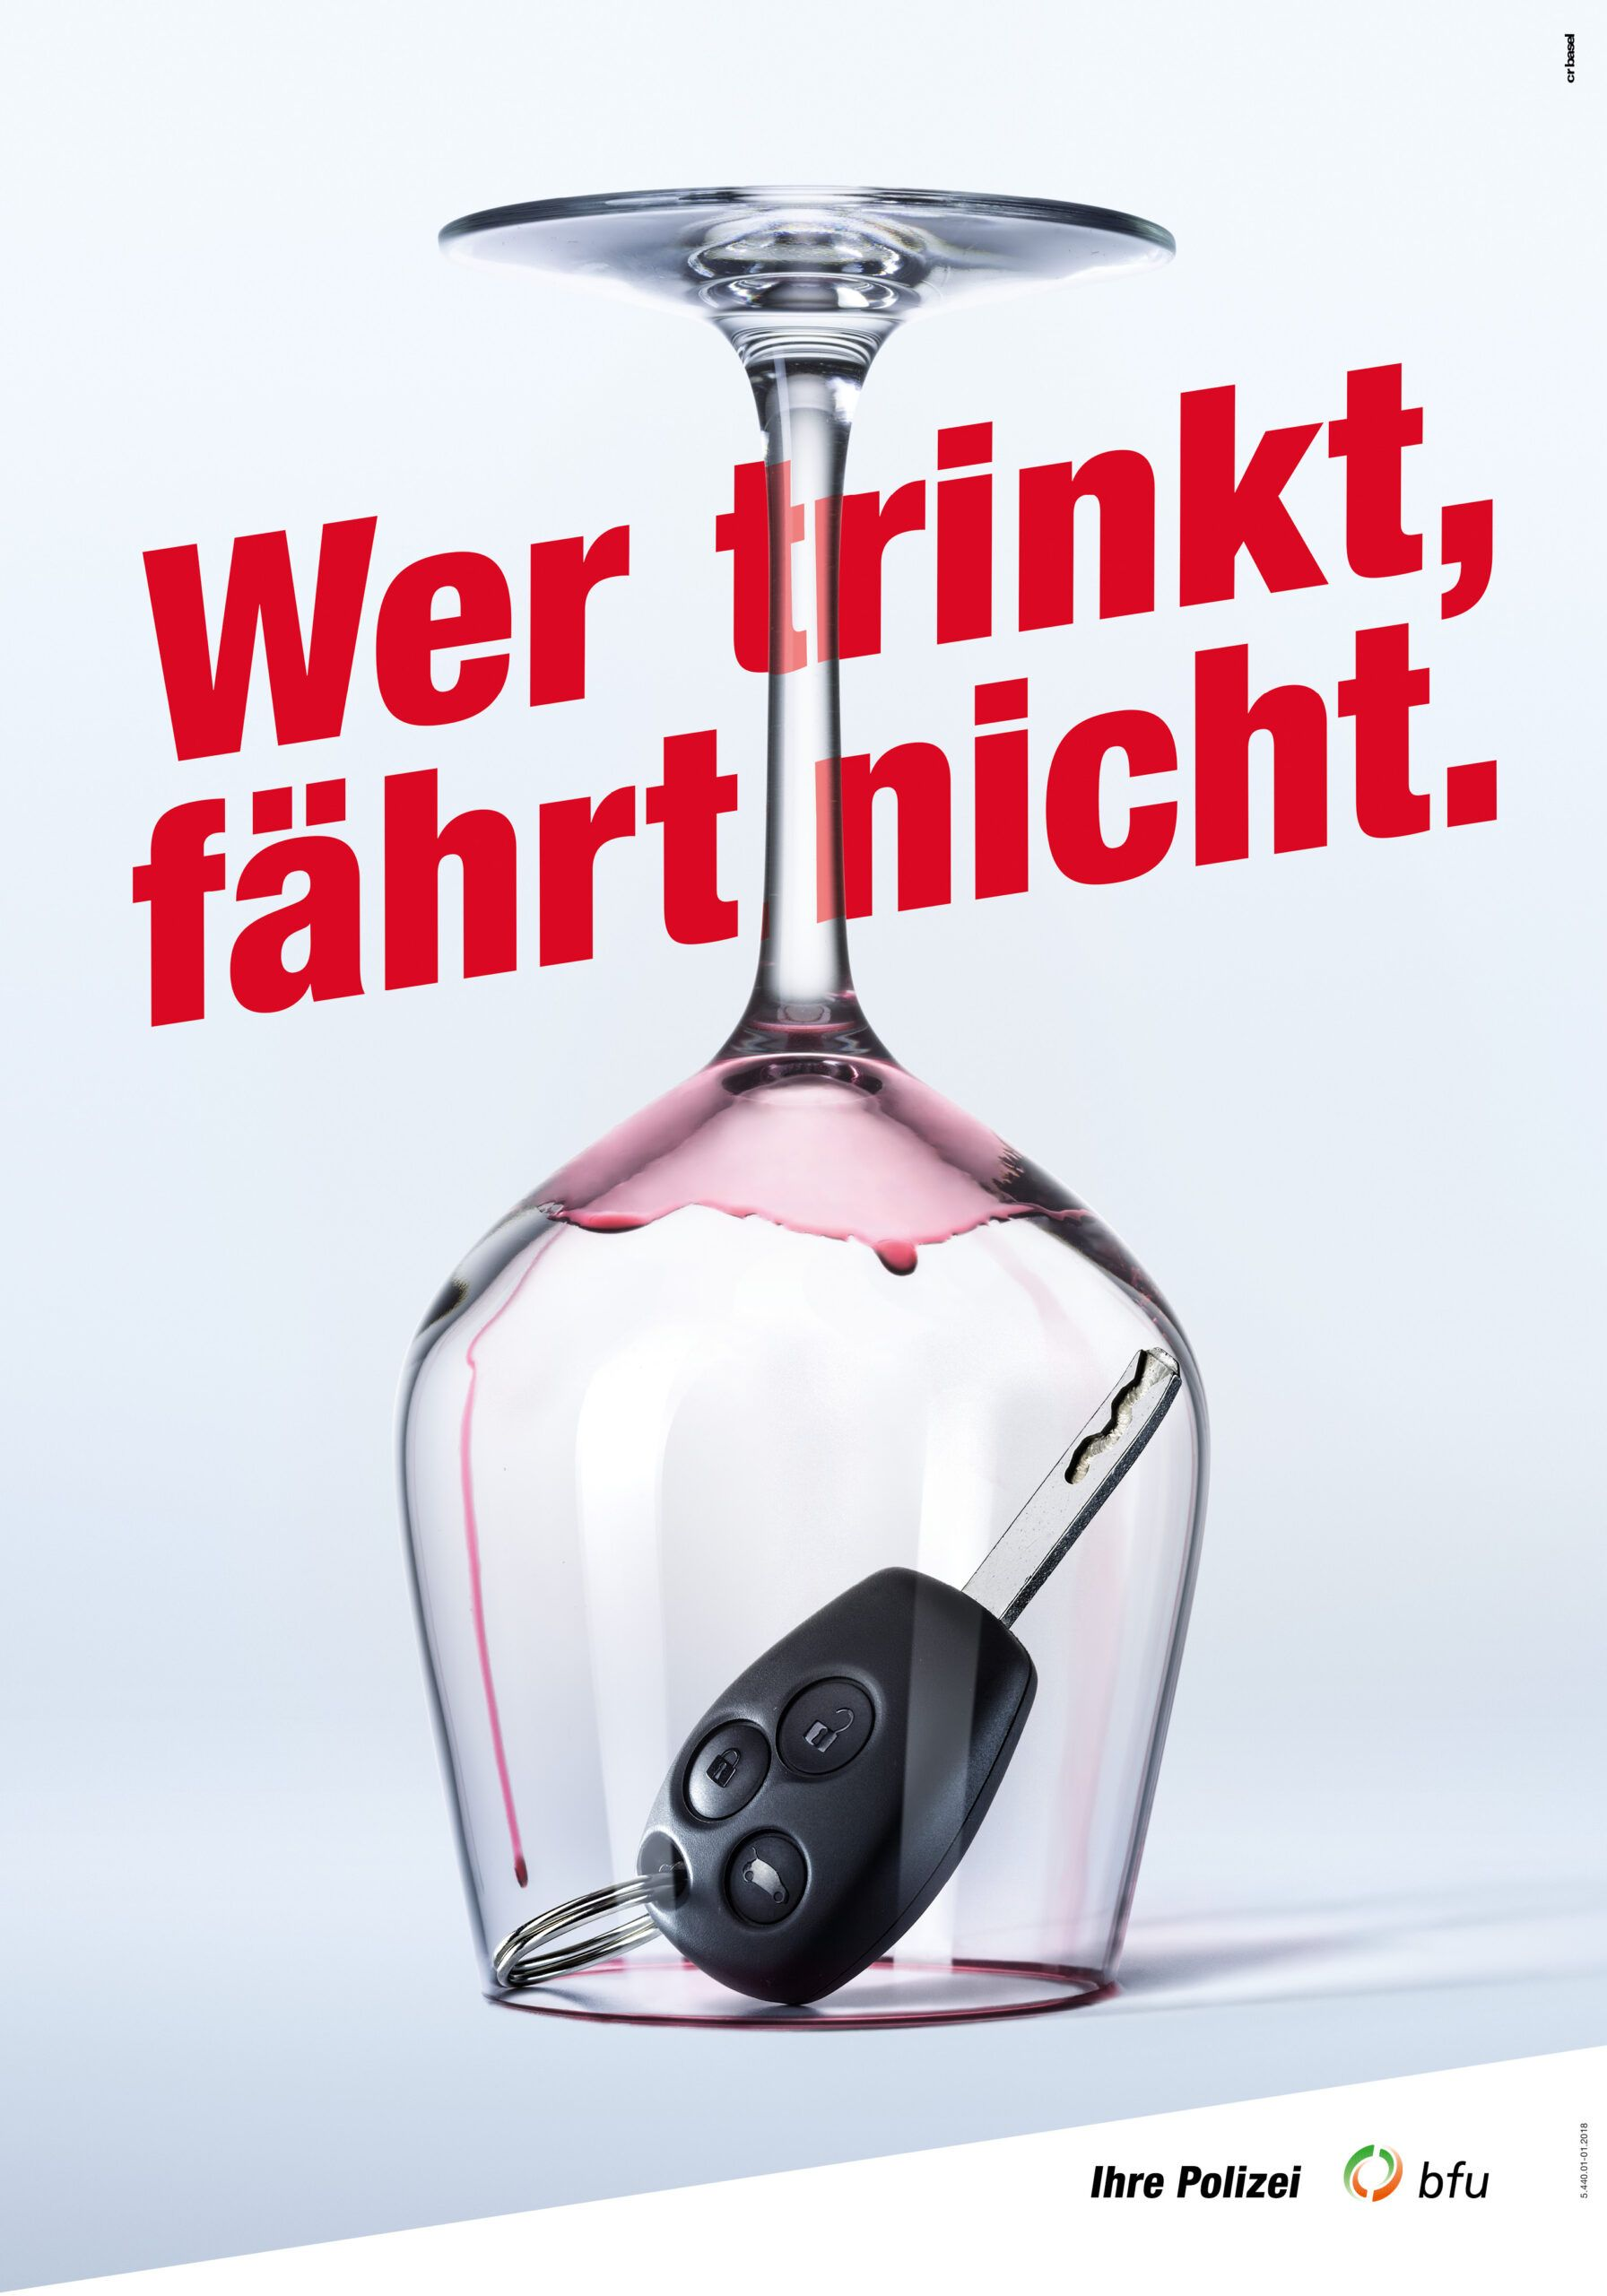 cr Basel Werbeagentur BFU prävention kampagne